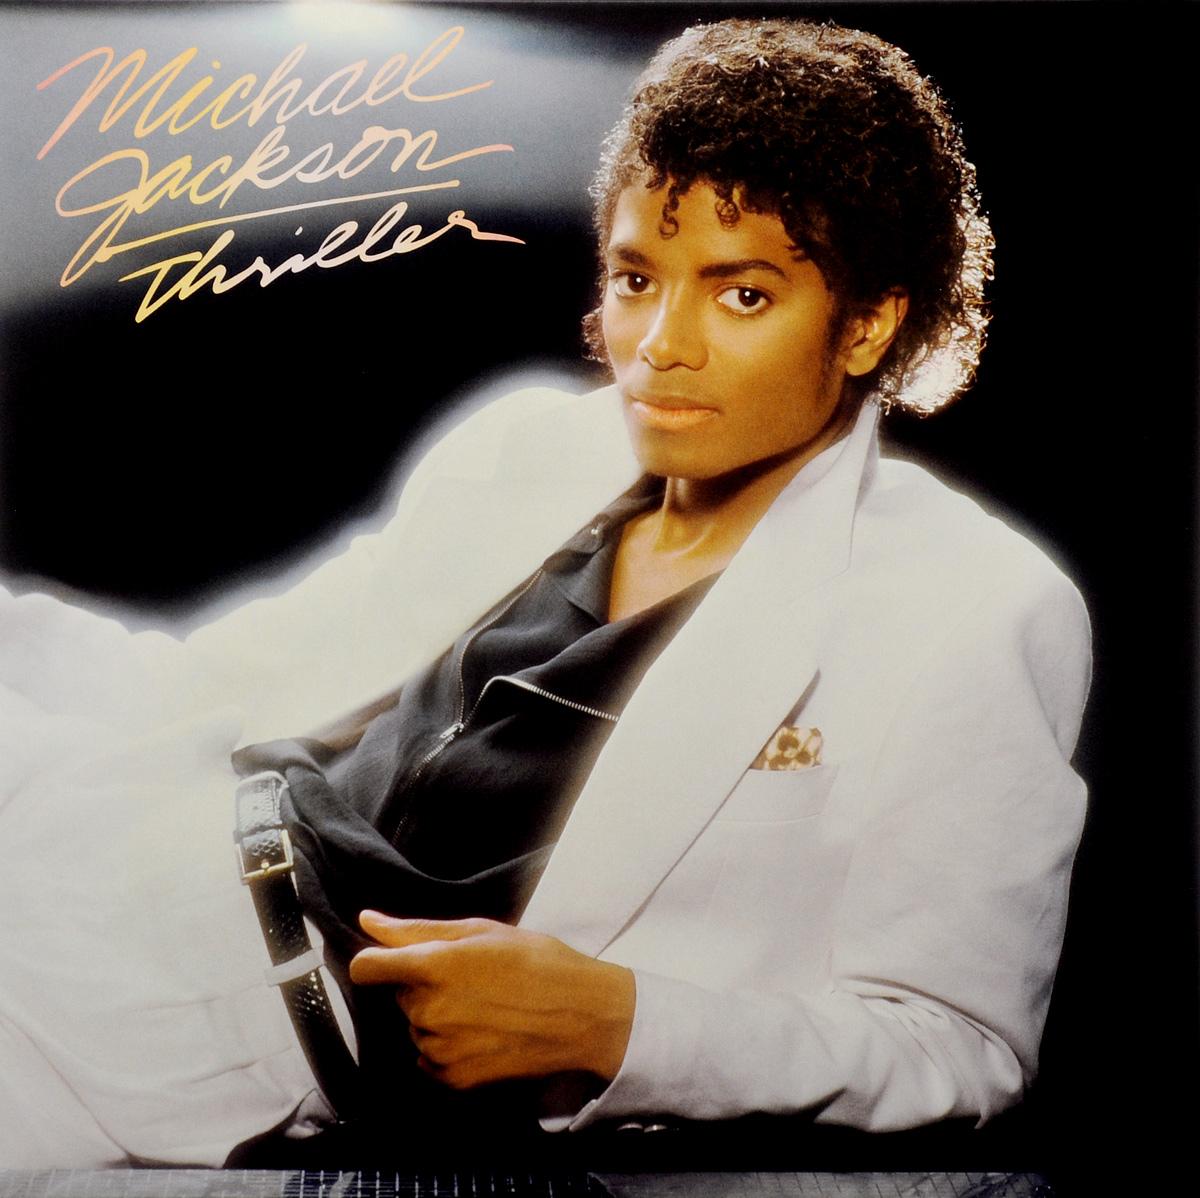 Майкл Джексон Michael Jackson. Thriller (LP) кэннонболл эдерли милт джексон cannonball adderley with milt jackson things are getting better lp